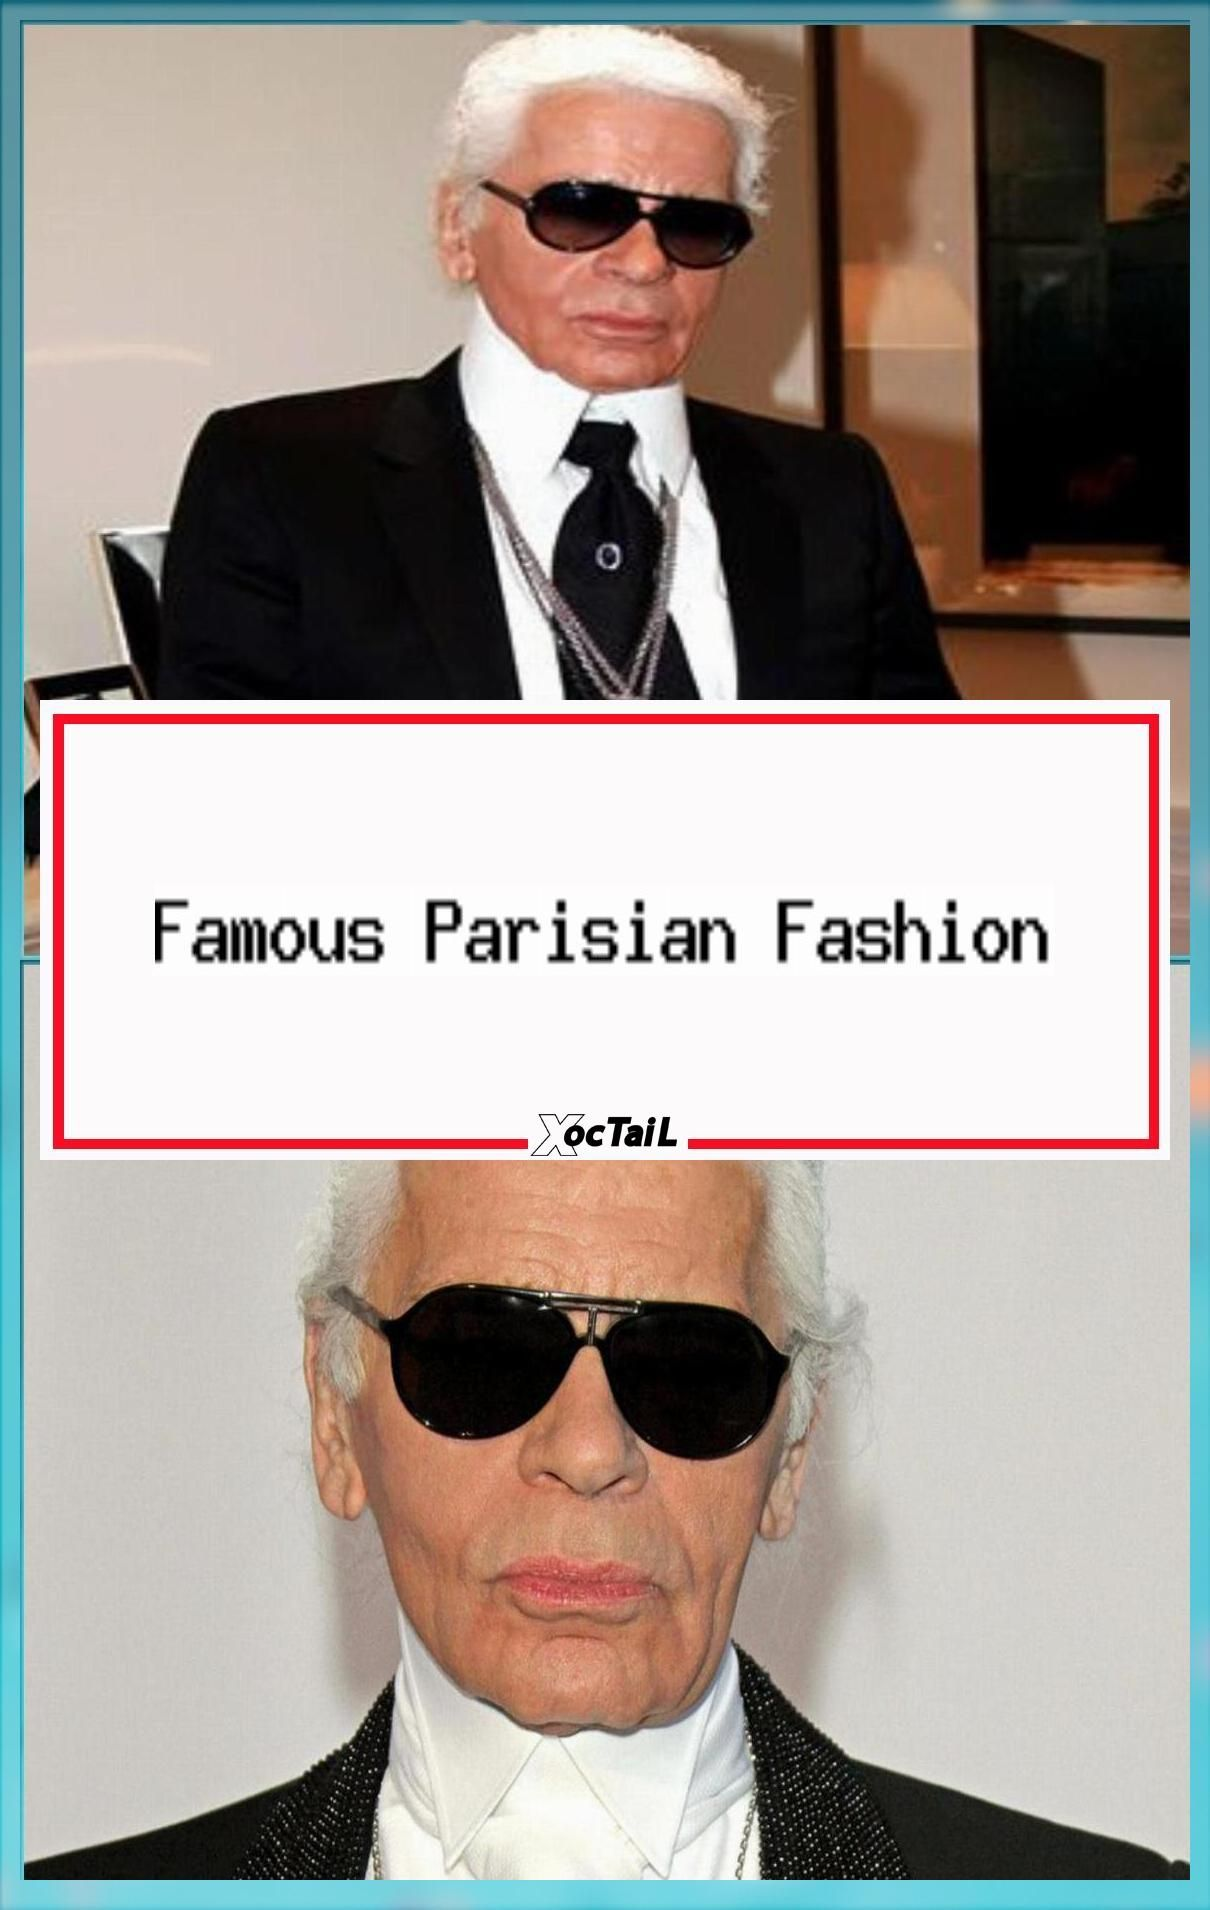 Famous Parisian Fashion Houses List Of Famous Fashion Designers Karl Lagerfeld Famous Luxury Most Couture Chanel Ii Part Fendi Germany Hands Dresses Designi 2020